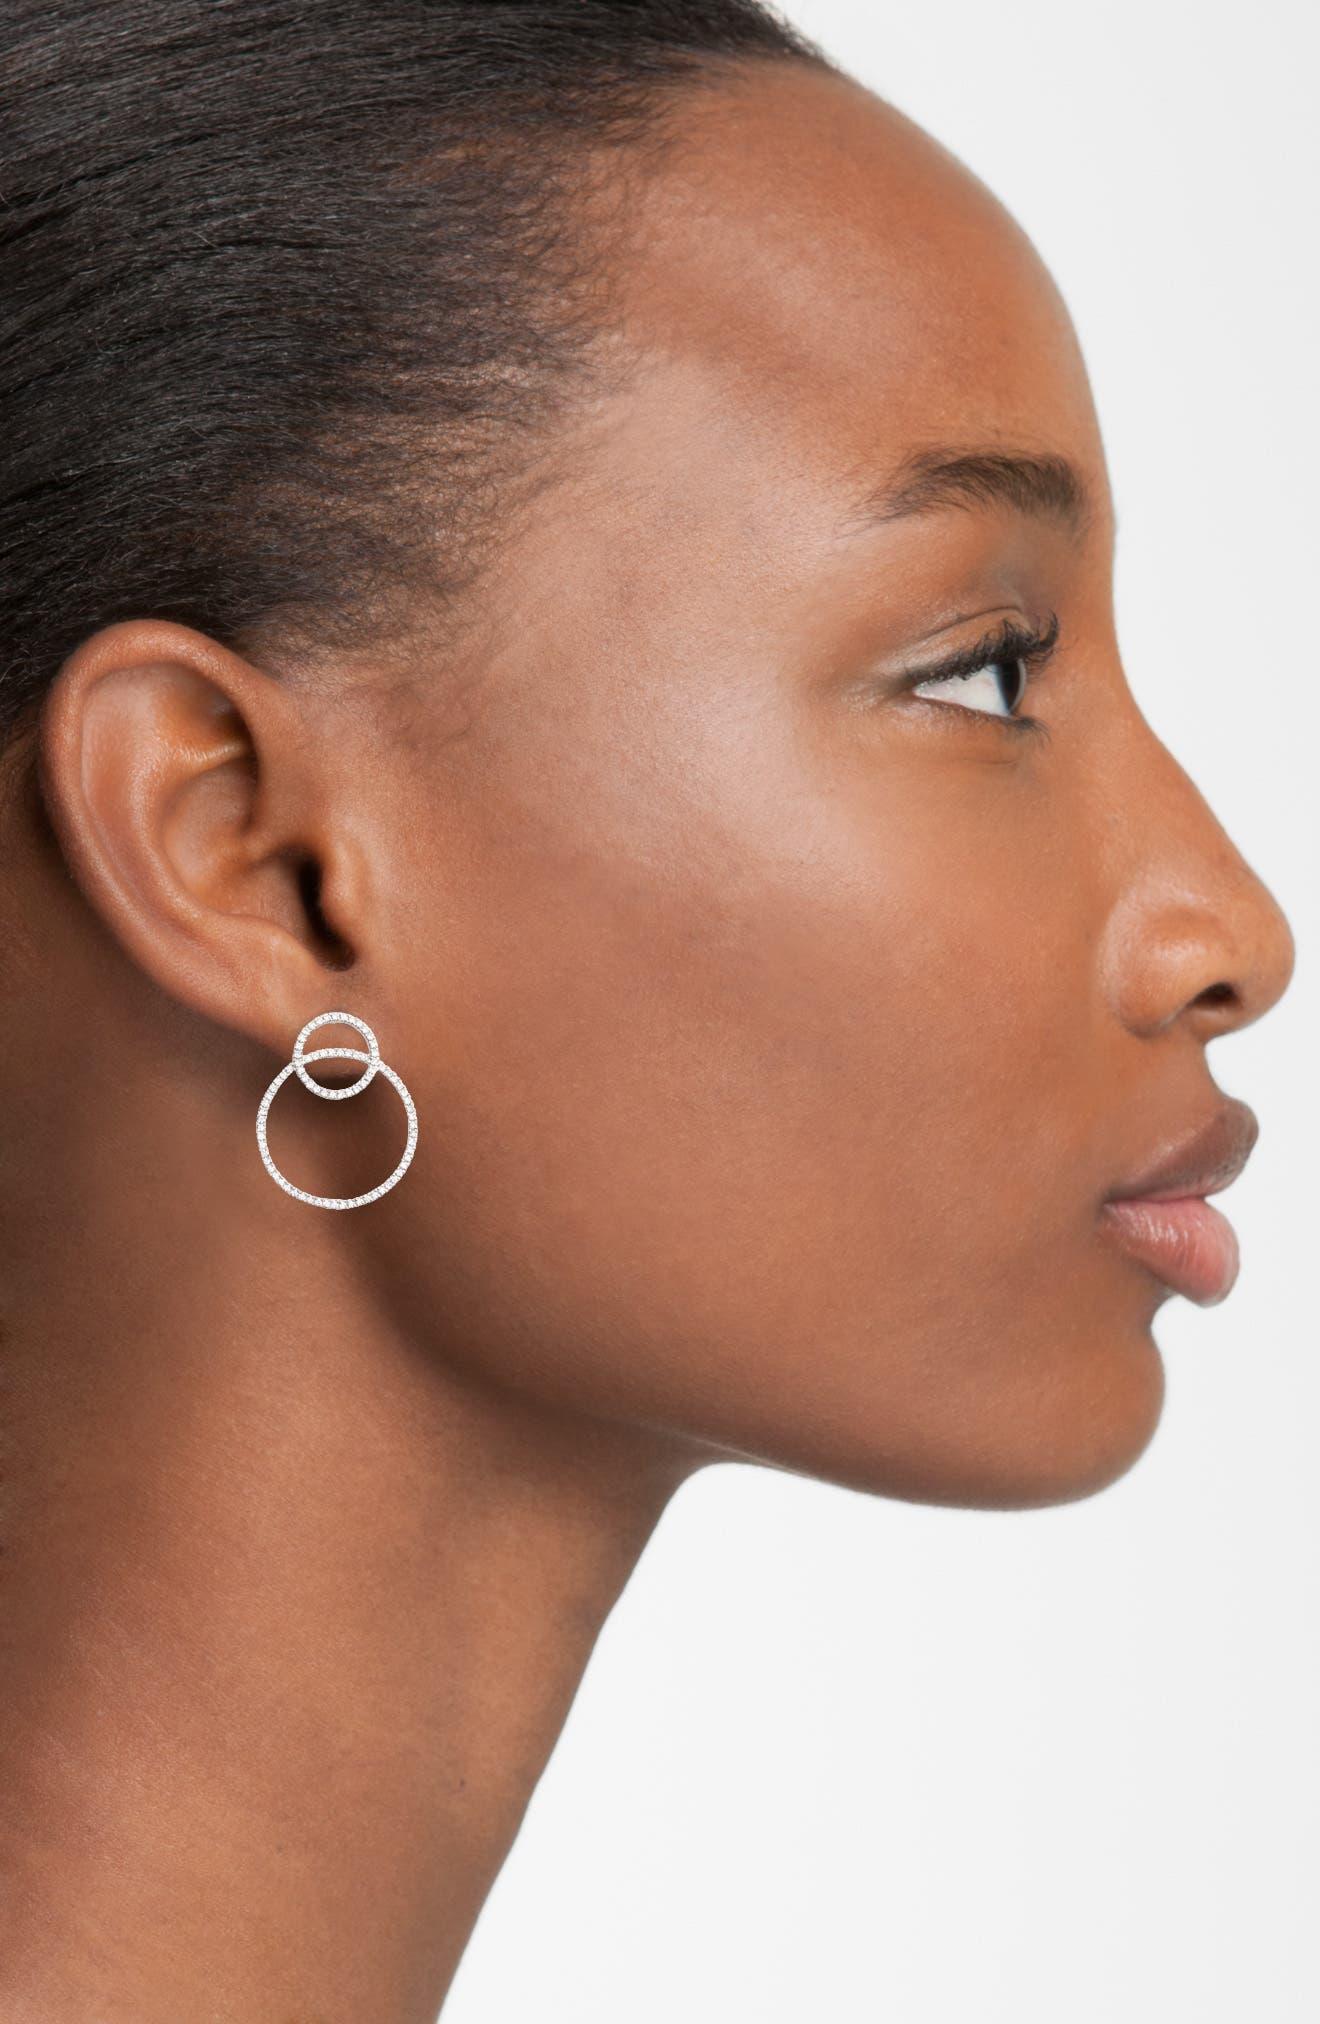 Prism Double Circle Diamond Earrings,                             Alternate thumbnail 2, color,                             WHITE GOLD